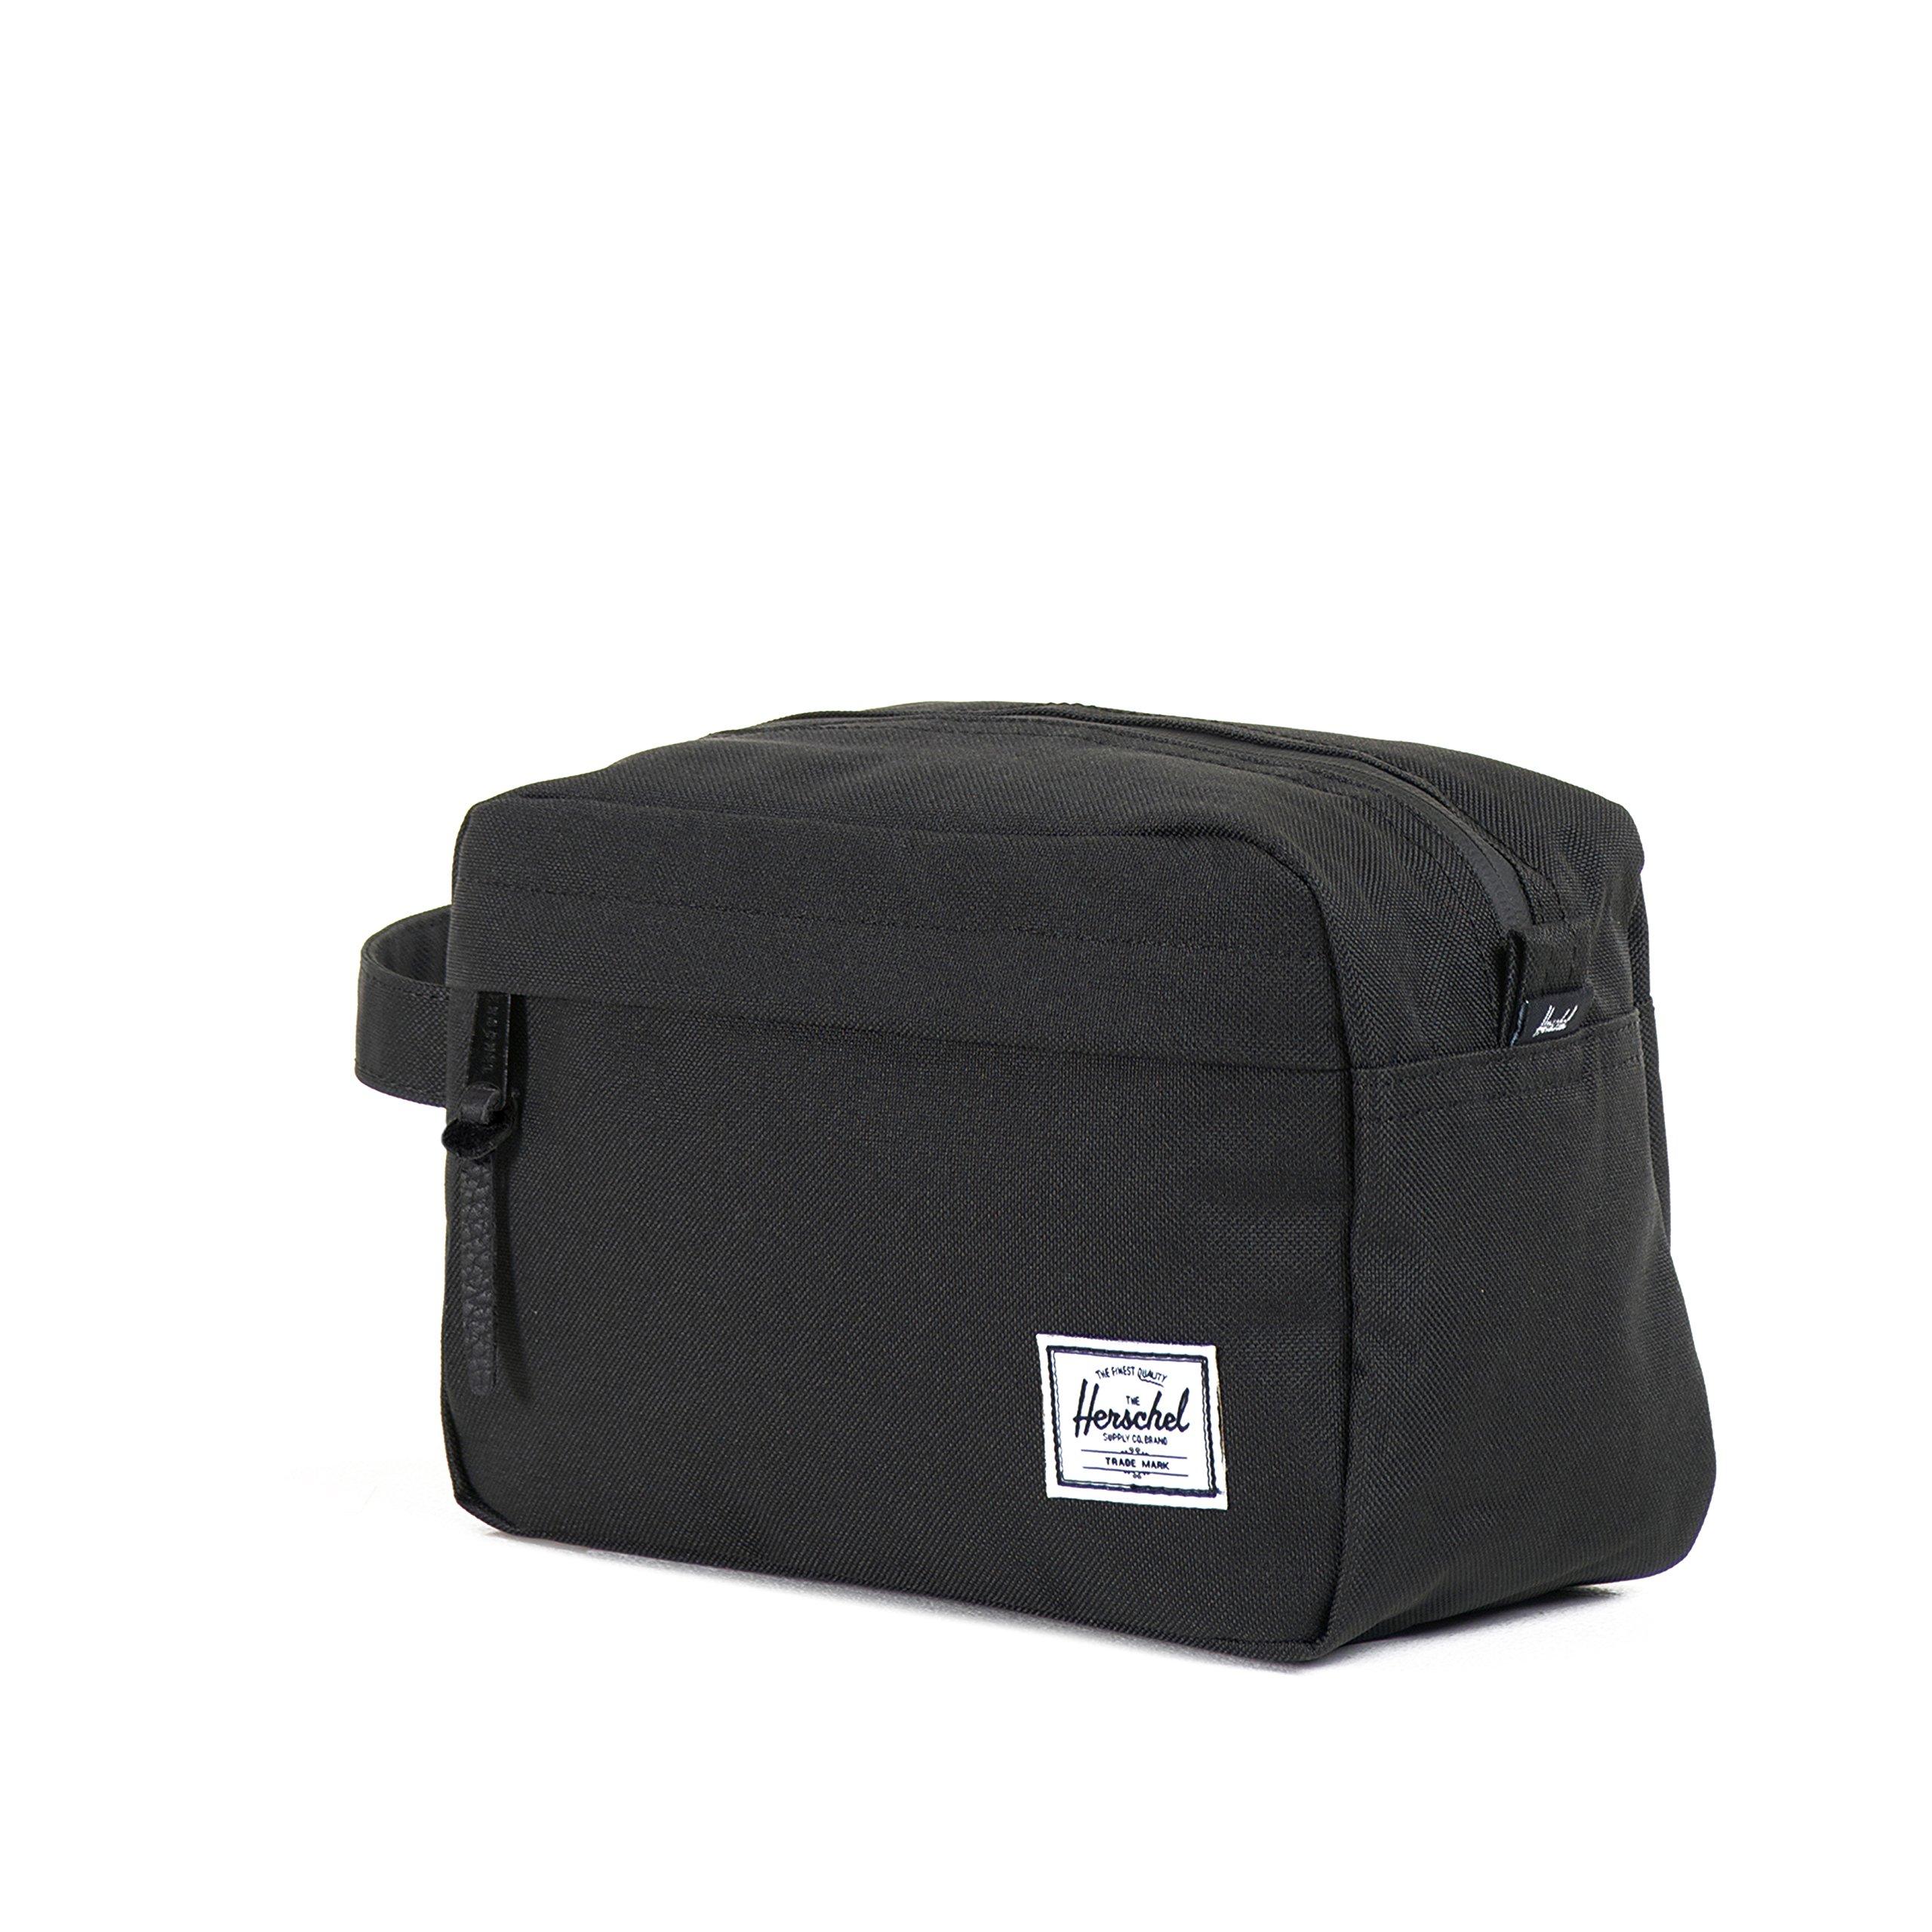 Herschel Supply Co. Chapter Travel Kit,Black,One Size by Herschel Supply Co. (Image #4)